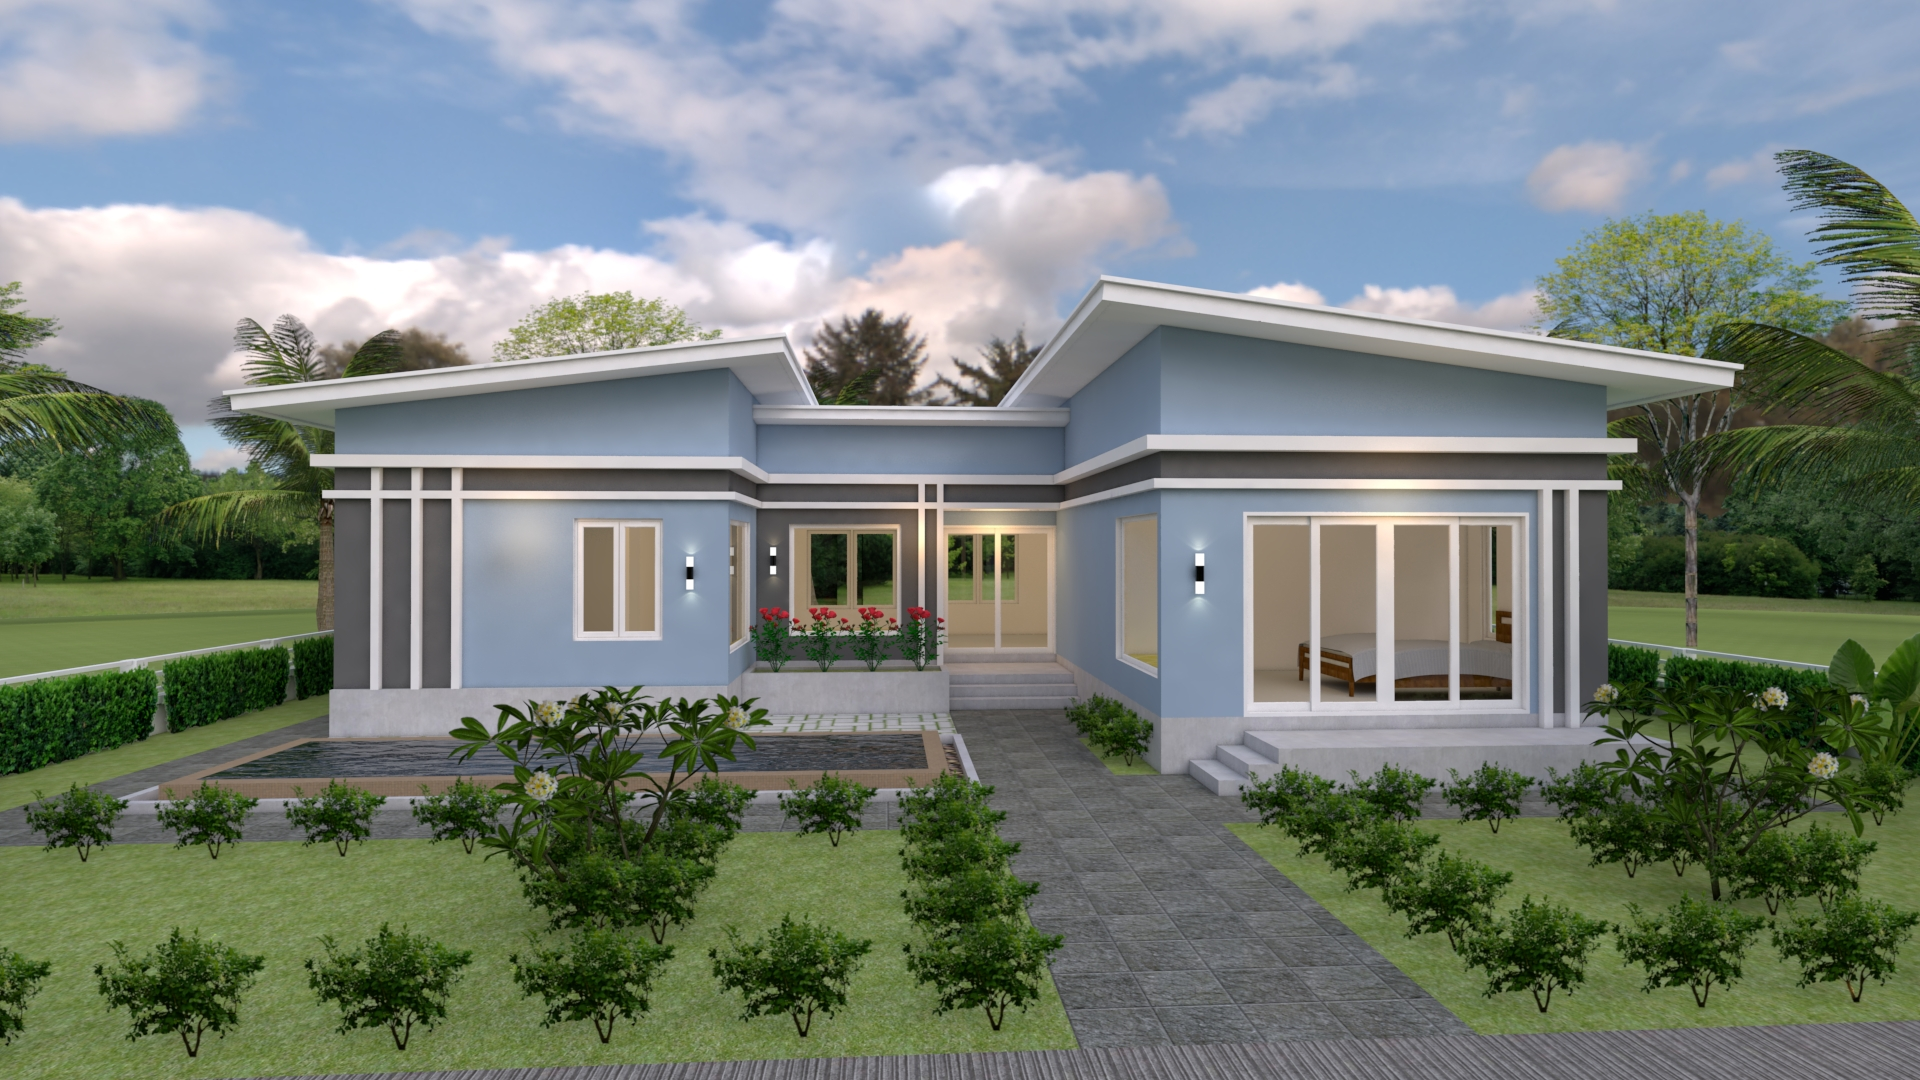 Cool House Plans 15x11 Meter 49x36 Feet 3 Beds 2